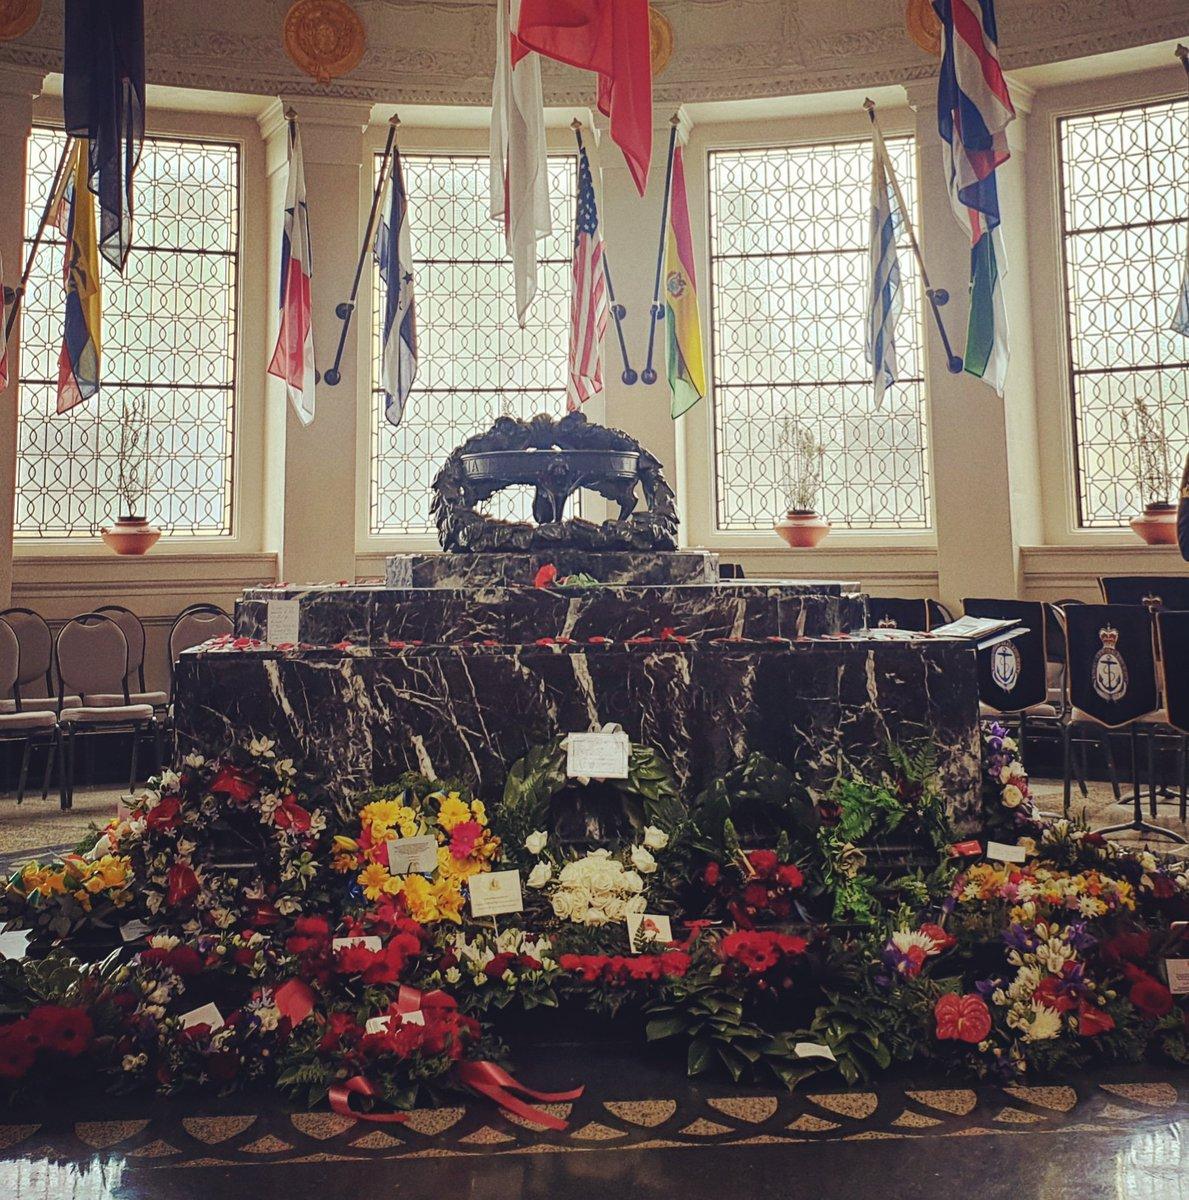 We Will Remember Them! Passchendaele 12 October #lestweforget  #Passchendaele #wewillrememberthem <br>http://pic.twitter.com/uGmNtc8VJN